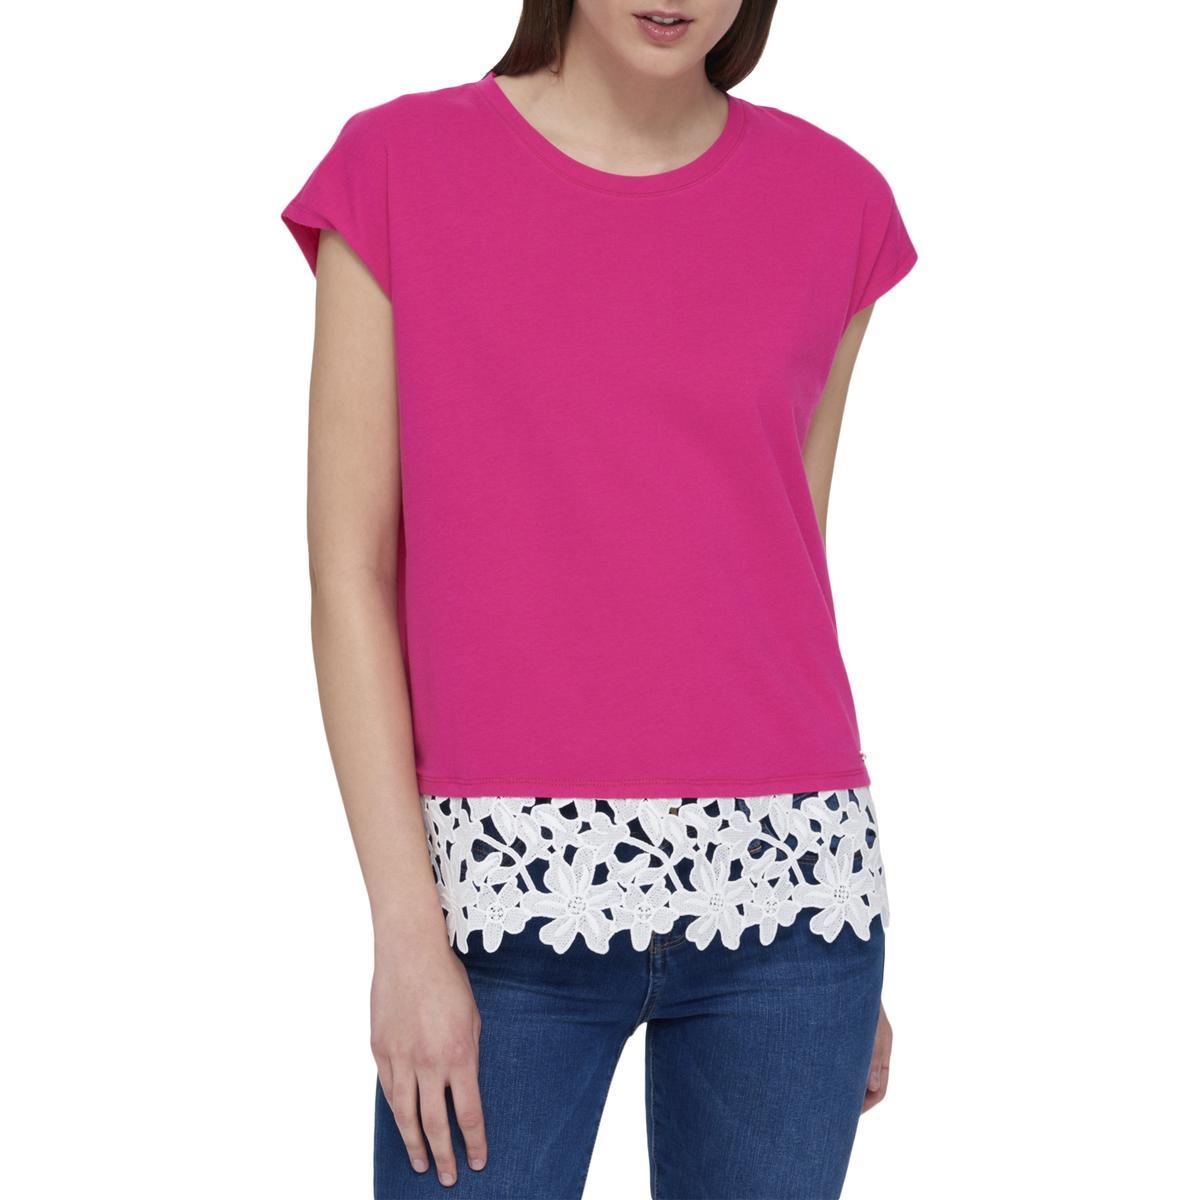 Tommy Hilfiger Womens 1238 Pink Lace Flower Cap Sleeve Top Xl B B Ebay